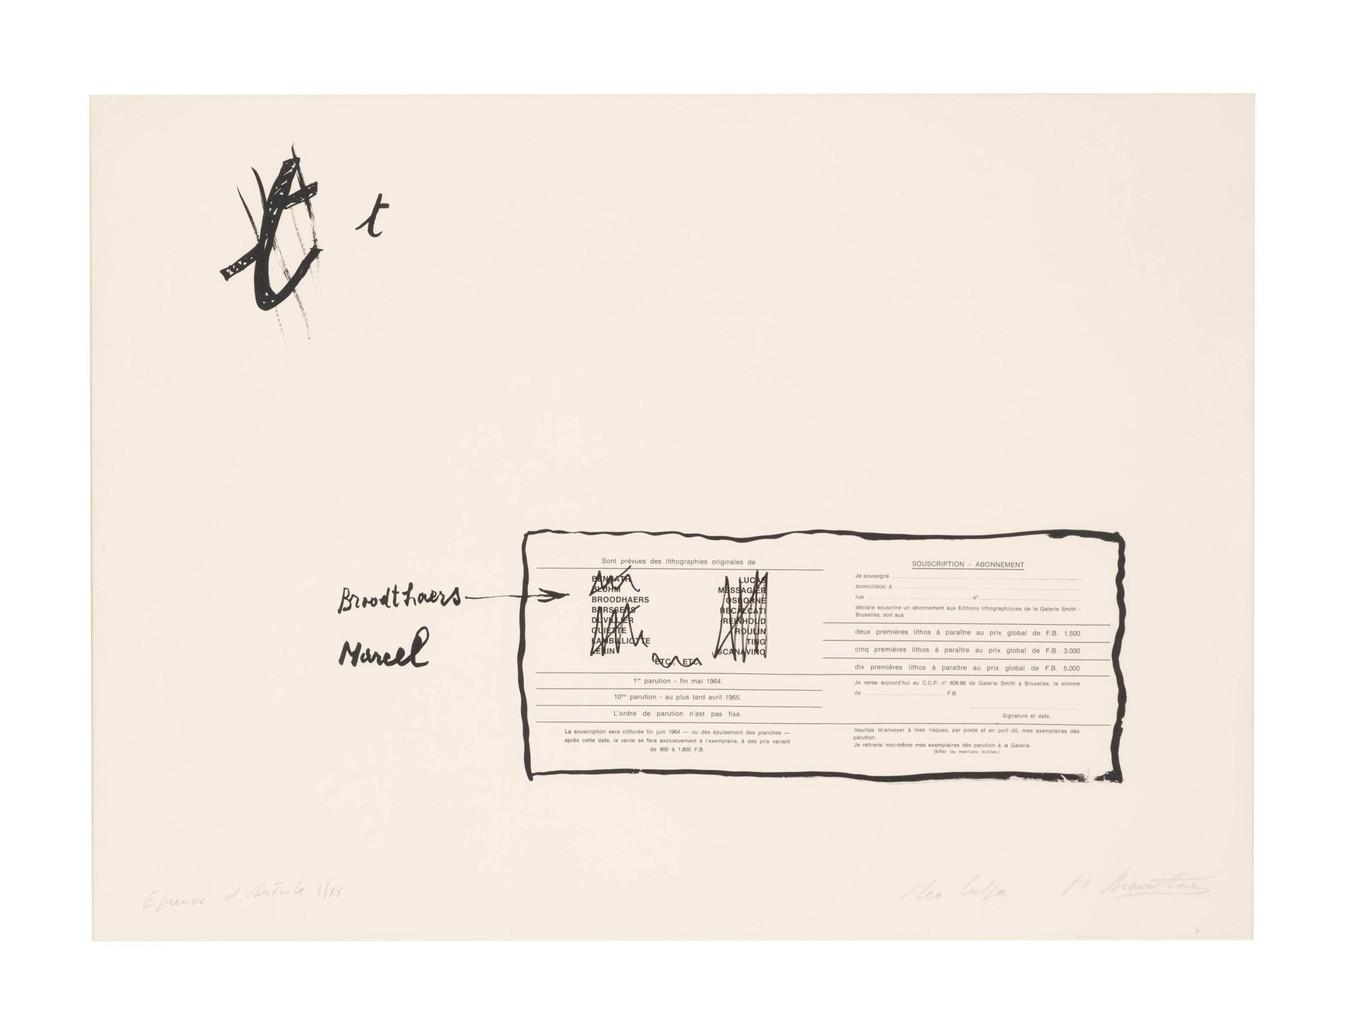 La Faute d'Orthographe (Mea culpa) by Broodthaers Marcel